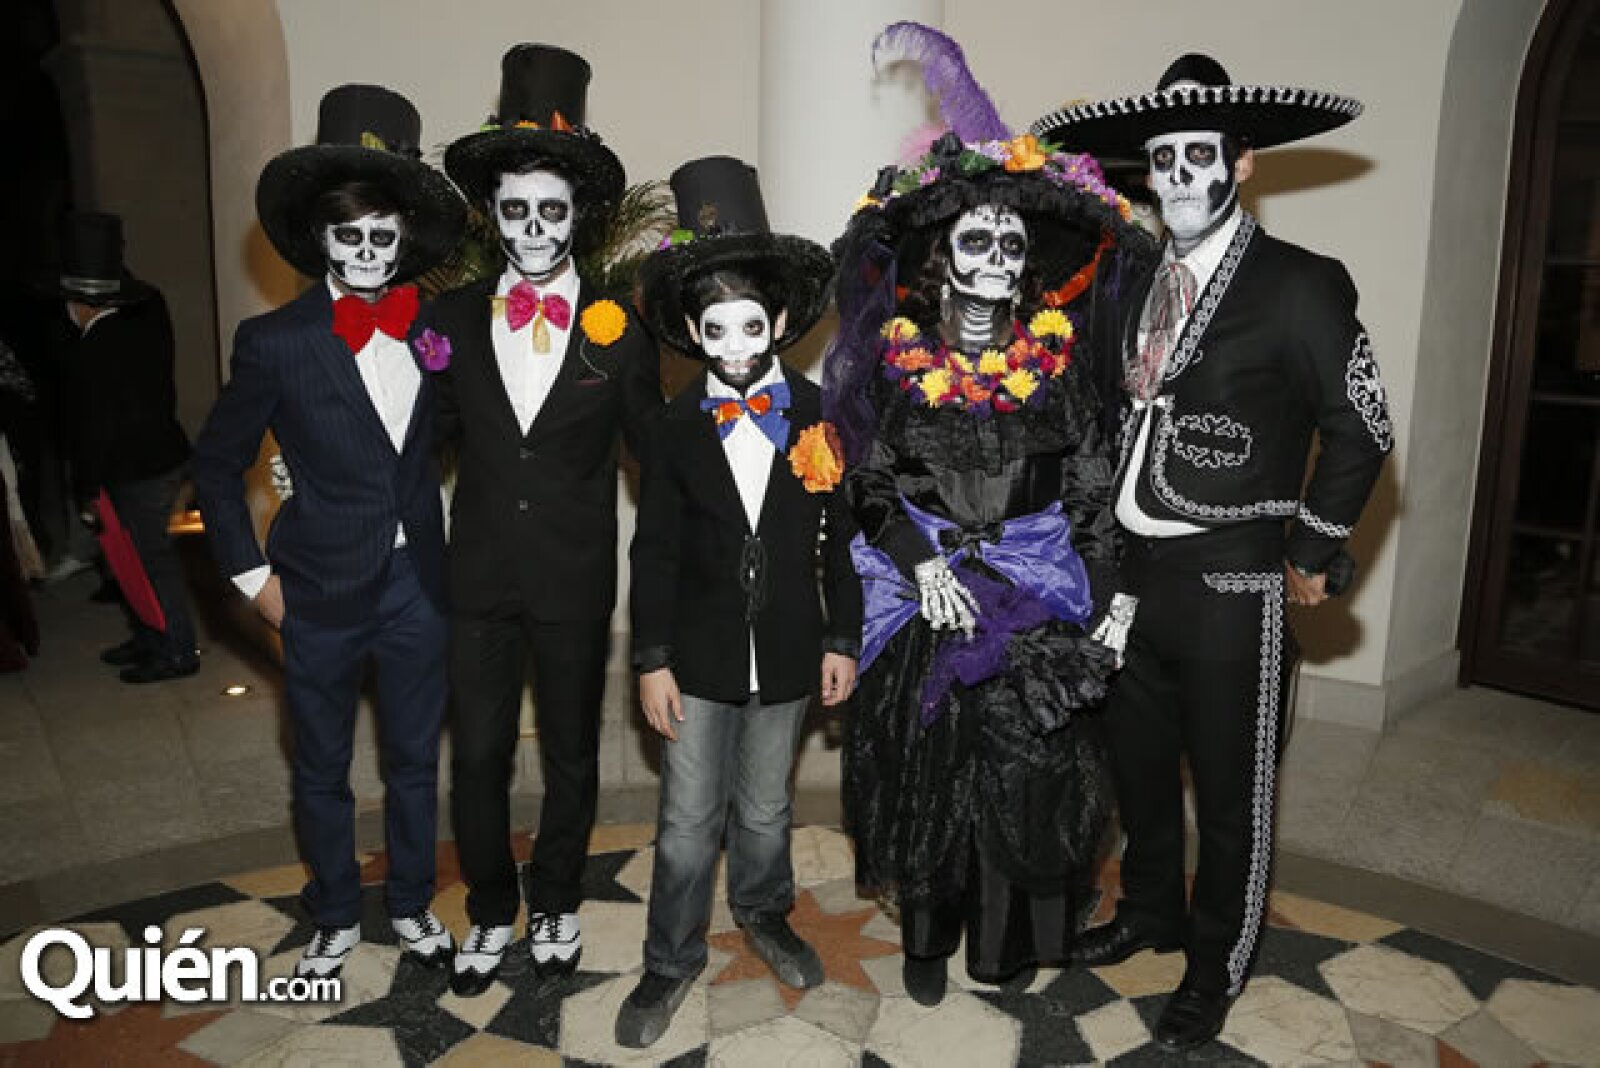 Juan García,Manuel,Enríquez,Fernando Enríquez,Claudia Enríquez,Manuel Enríquez